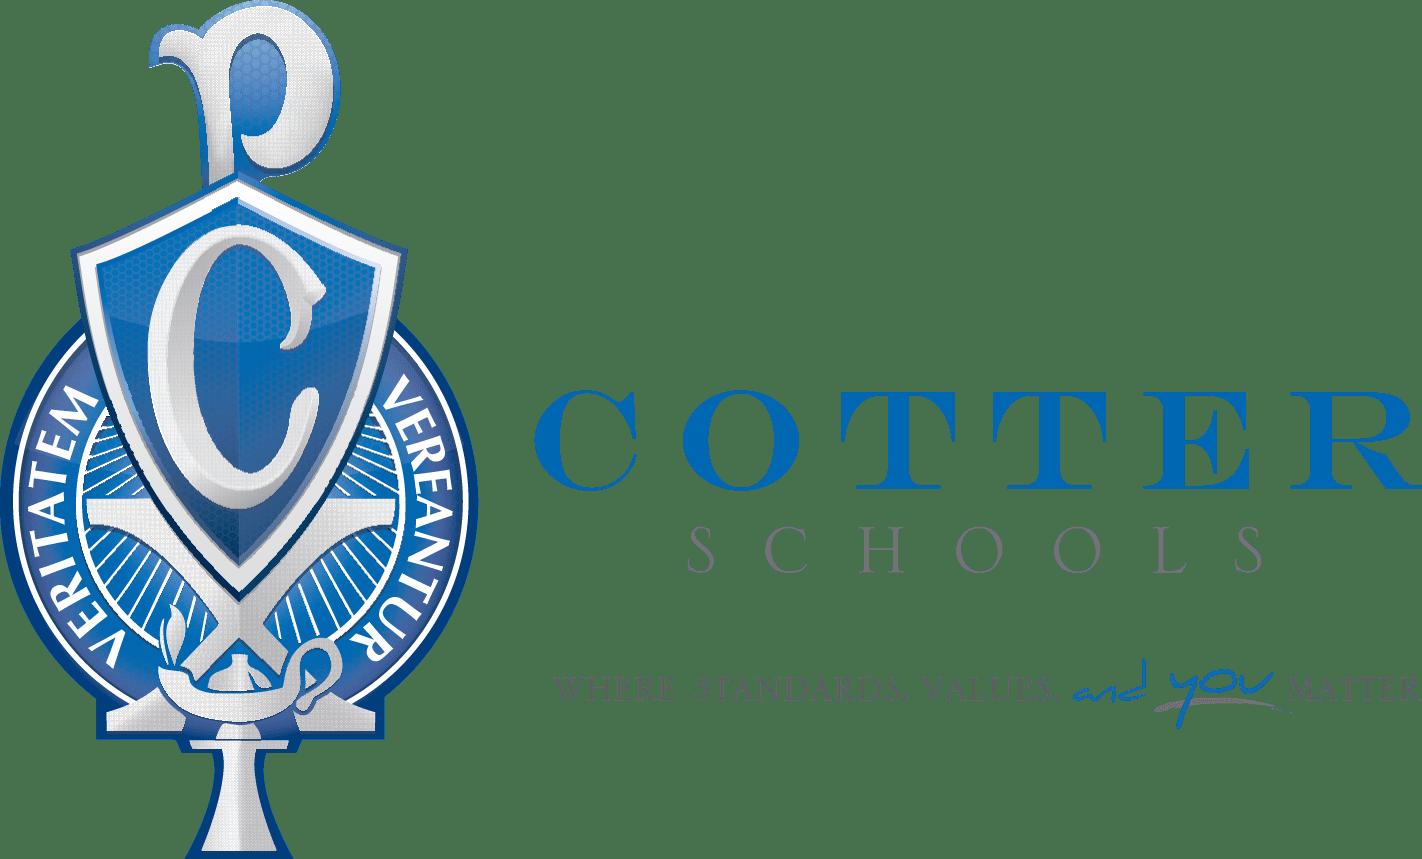 cotter schools; rok liceum w usa